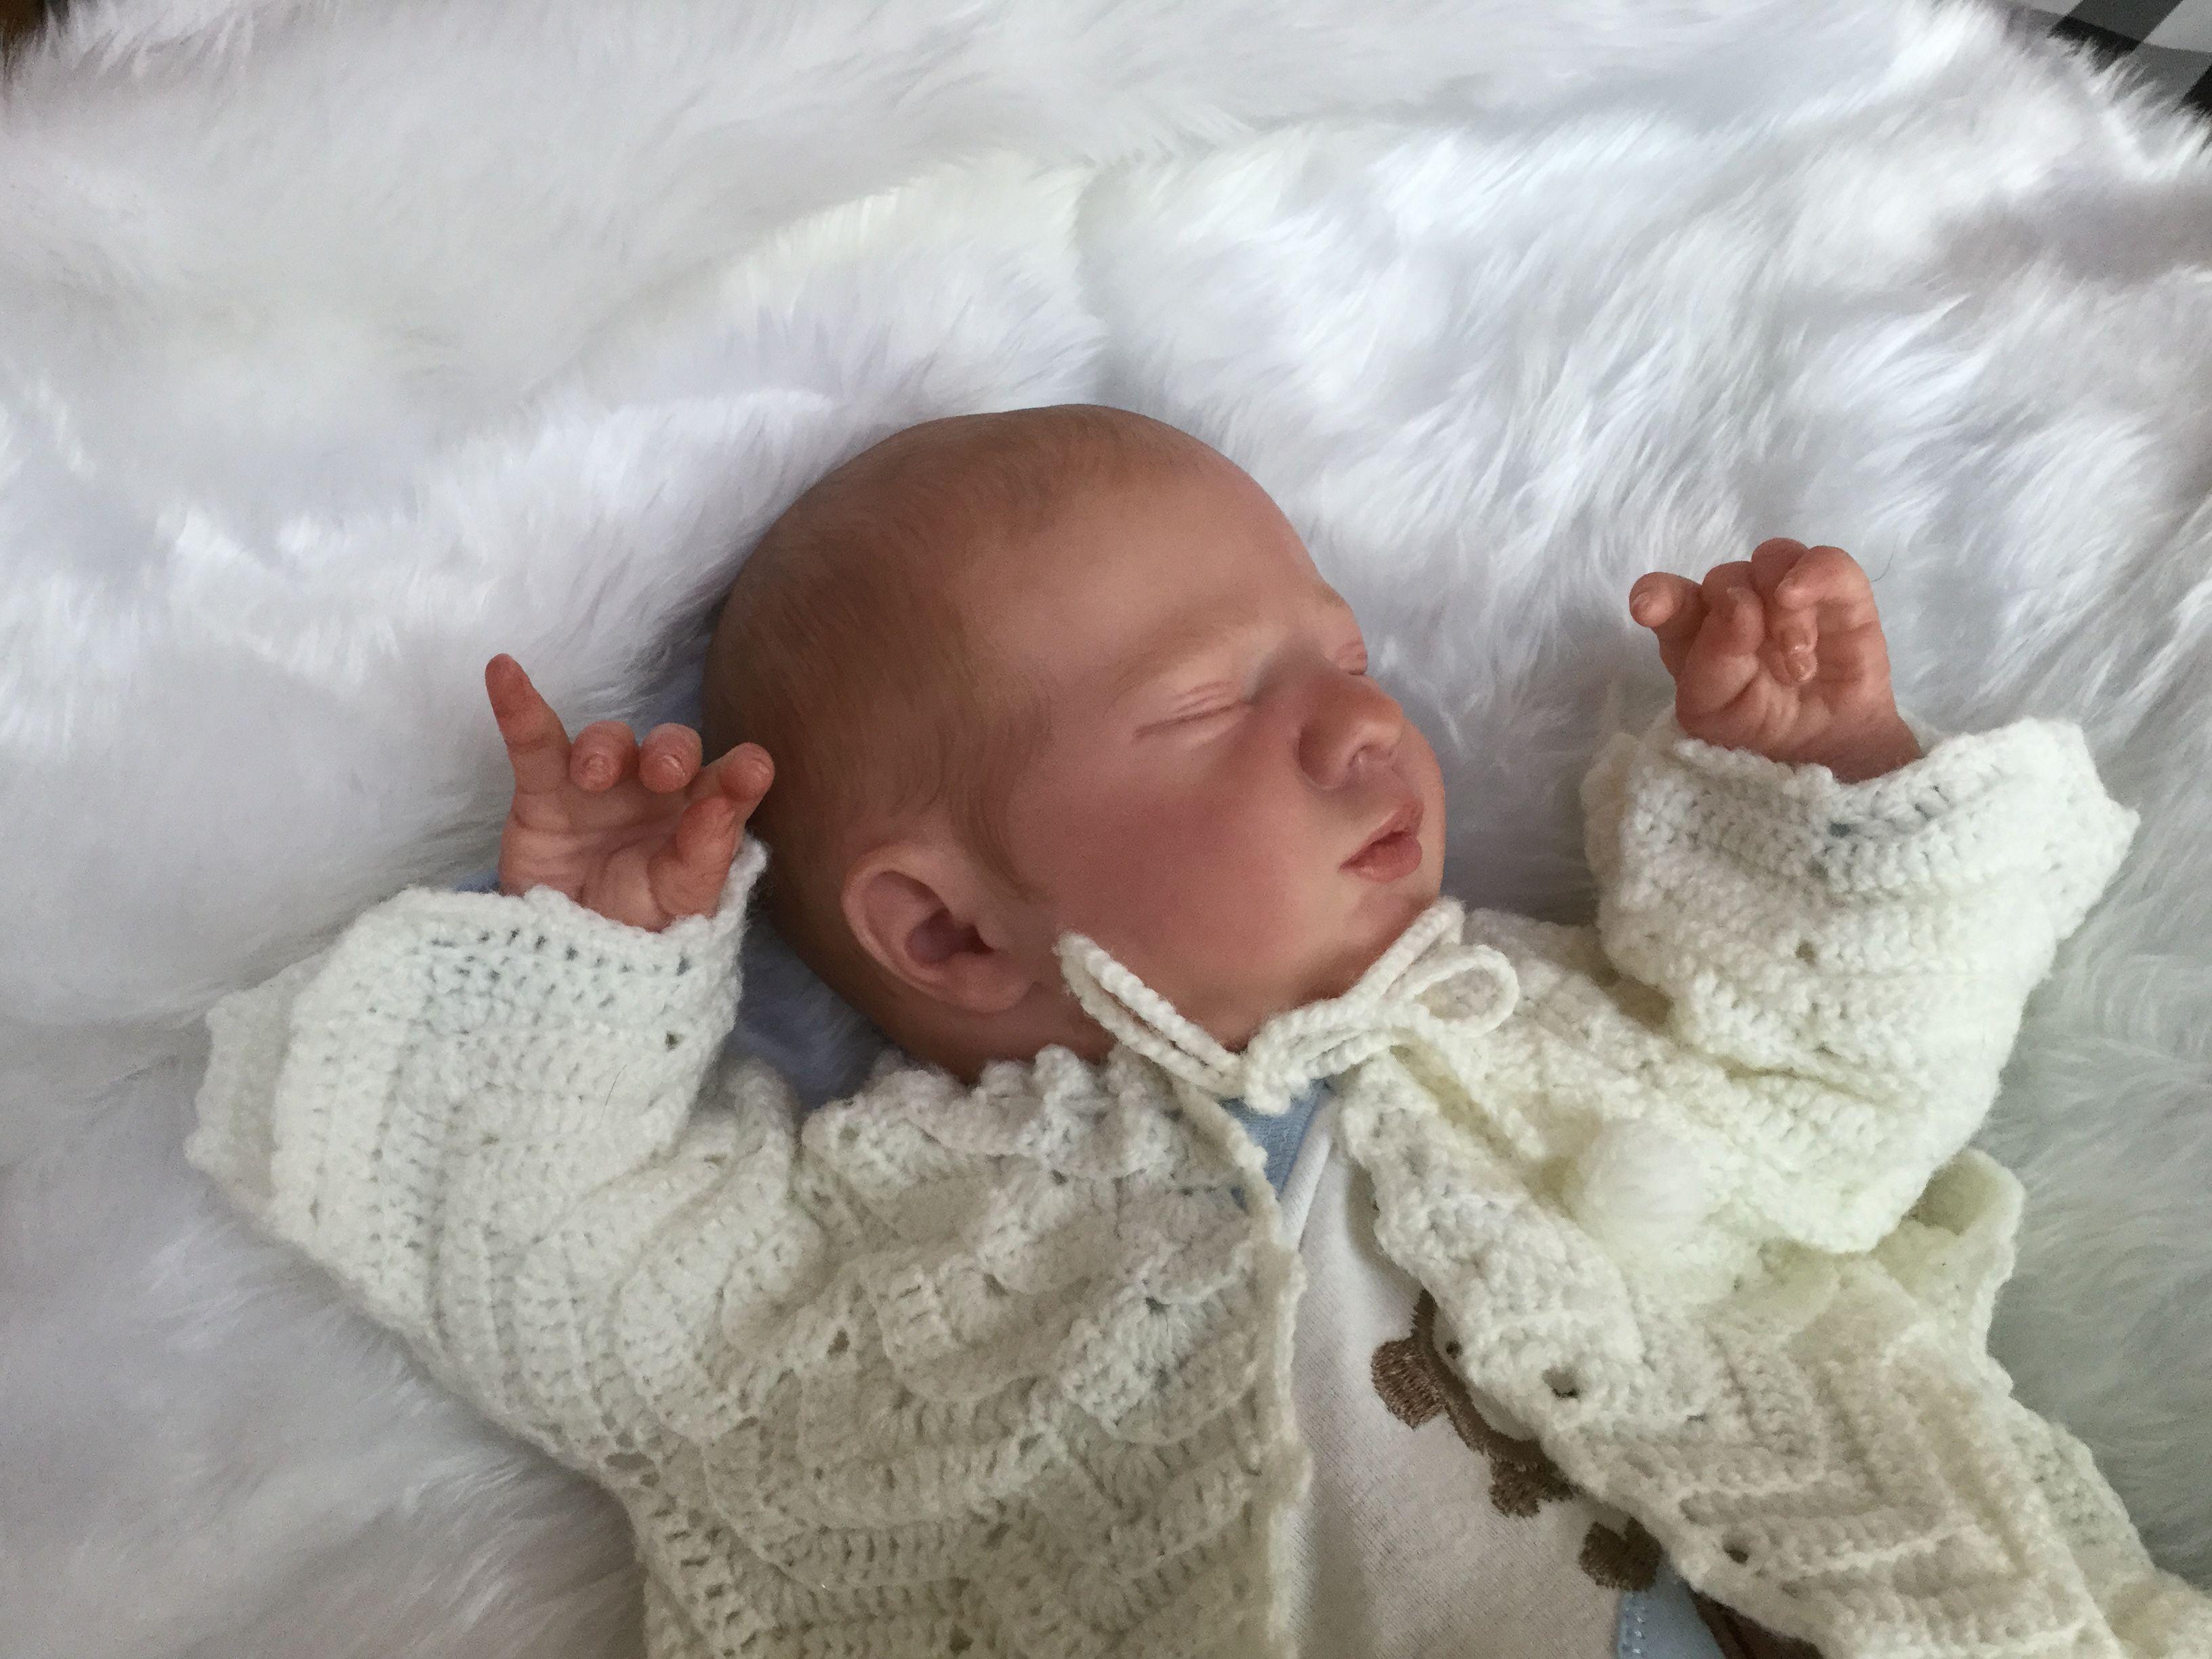 Baby bedtime youtube - Up For Adoption Realborn Logan 250 Mysweetcupcake On Youtube My Sweet Cupcake Nursery On Facebook